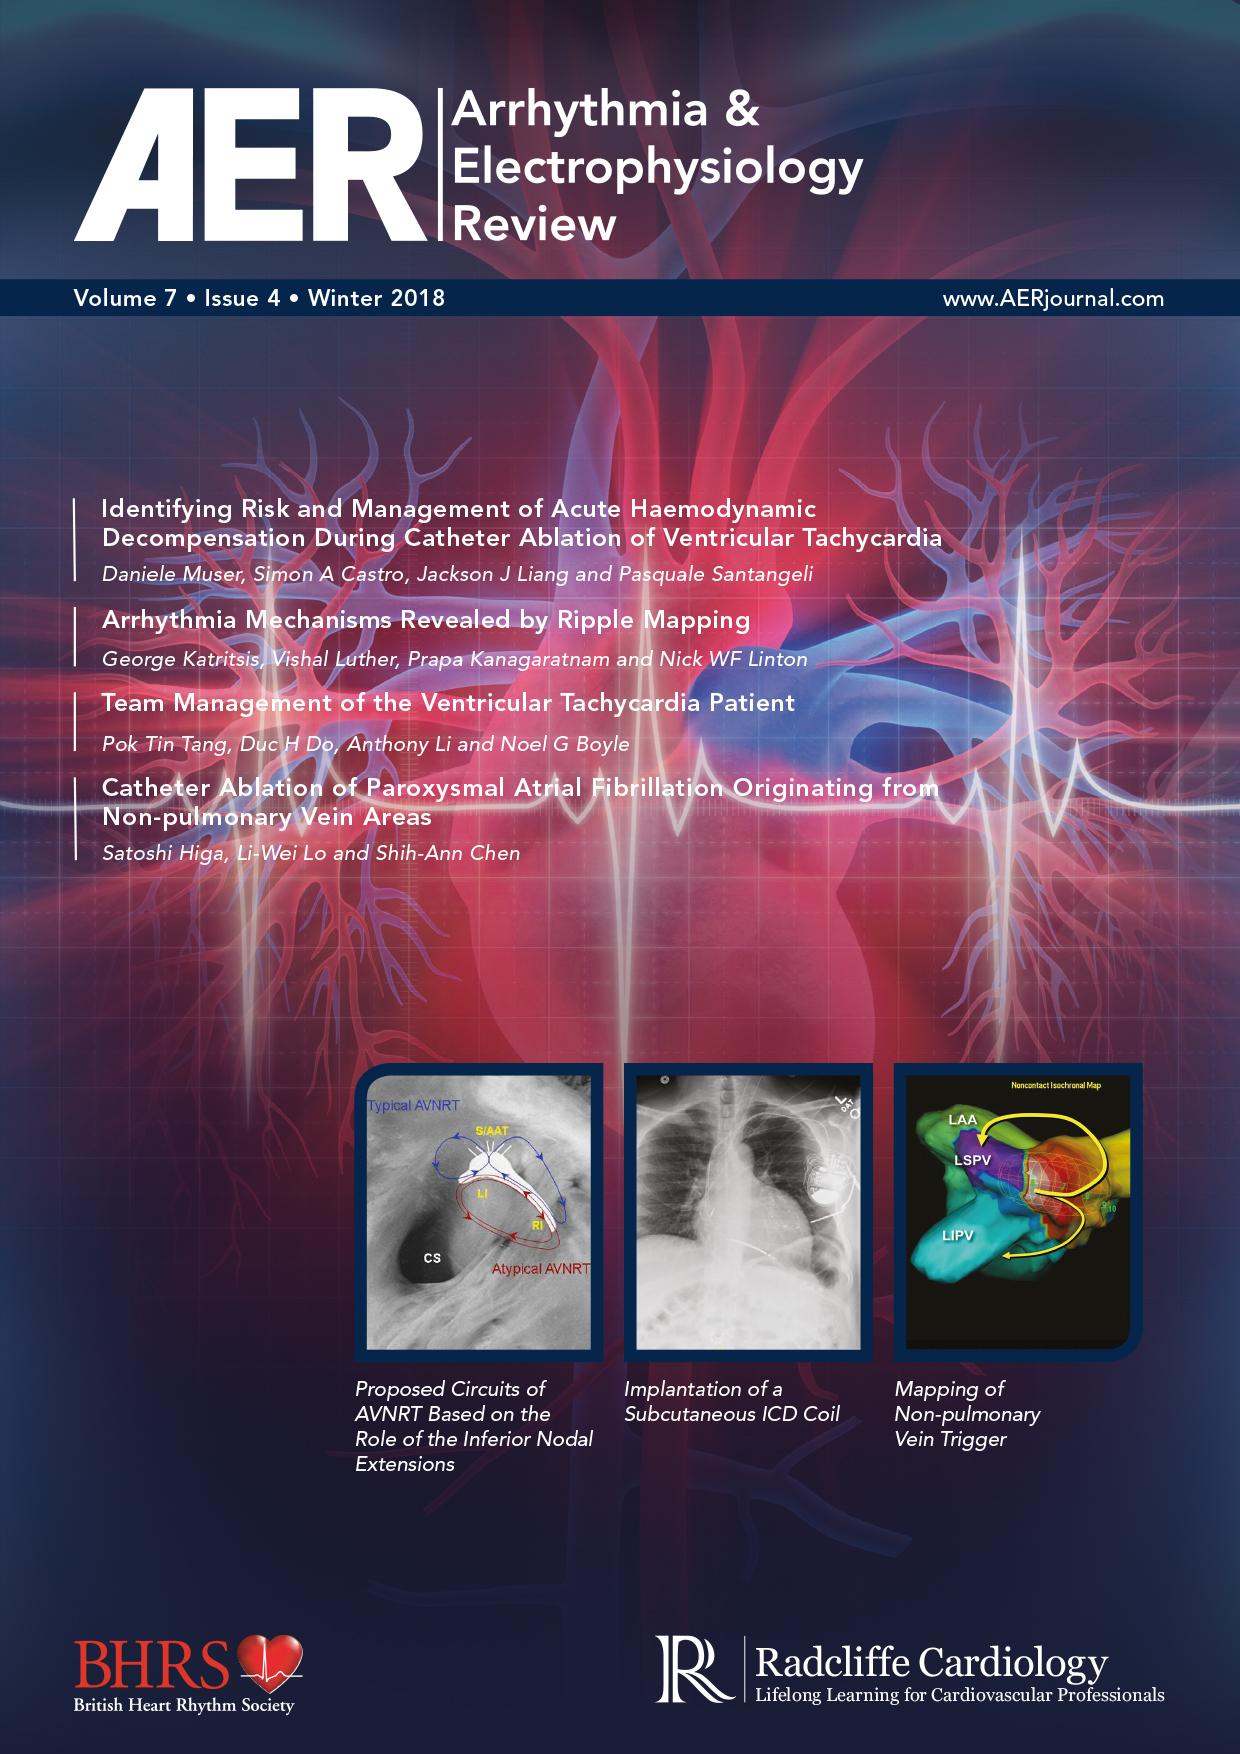 AER - Volume 7 Issue 4 Winter 2018